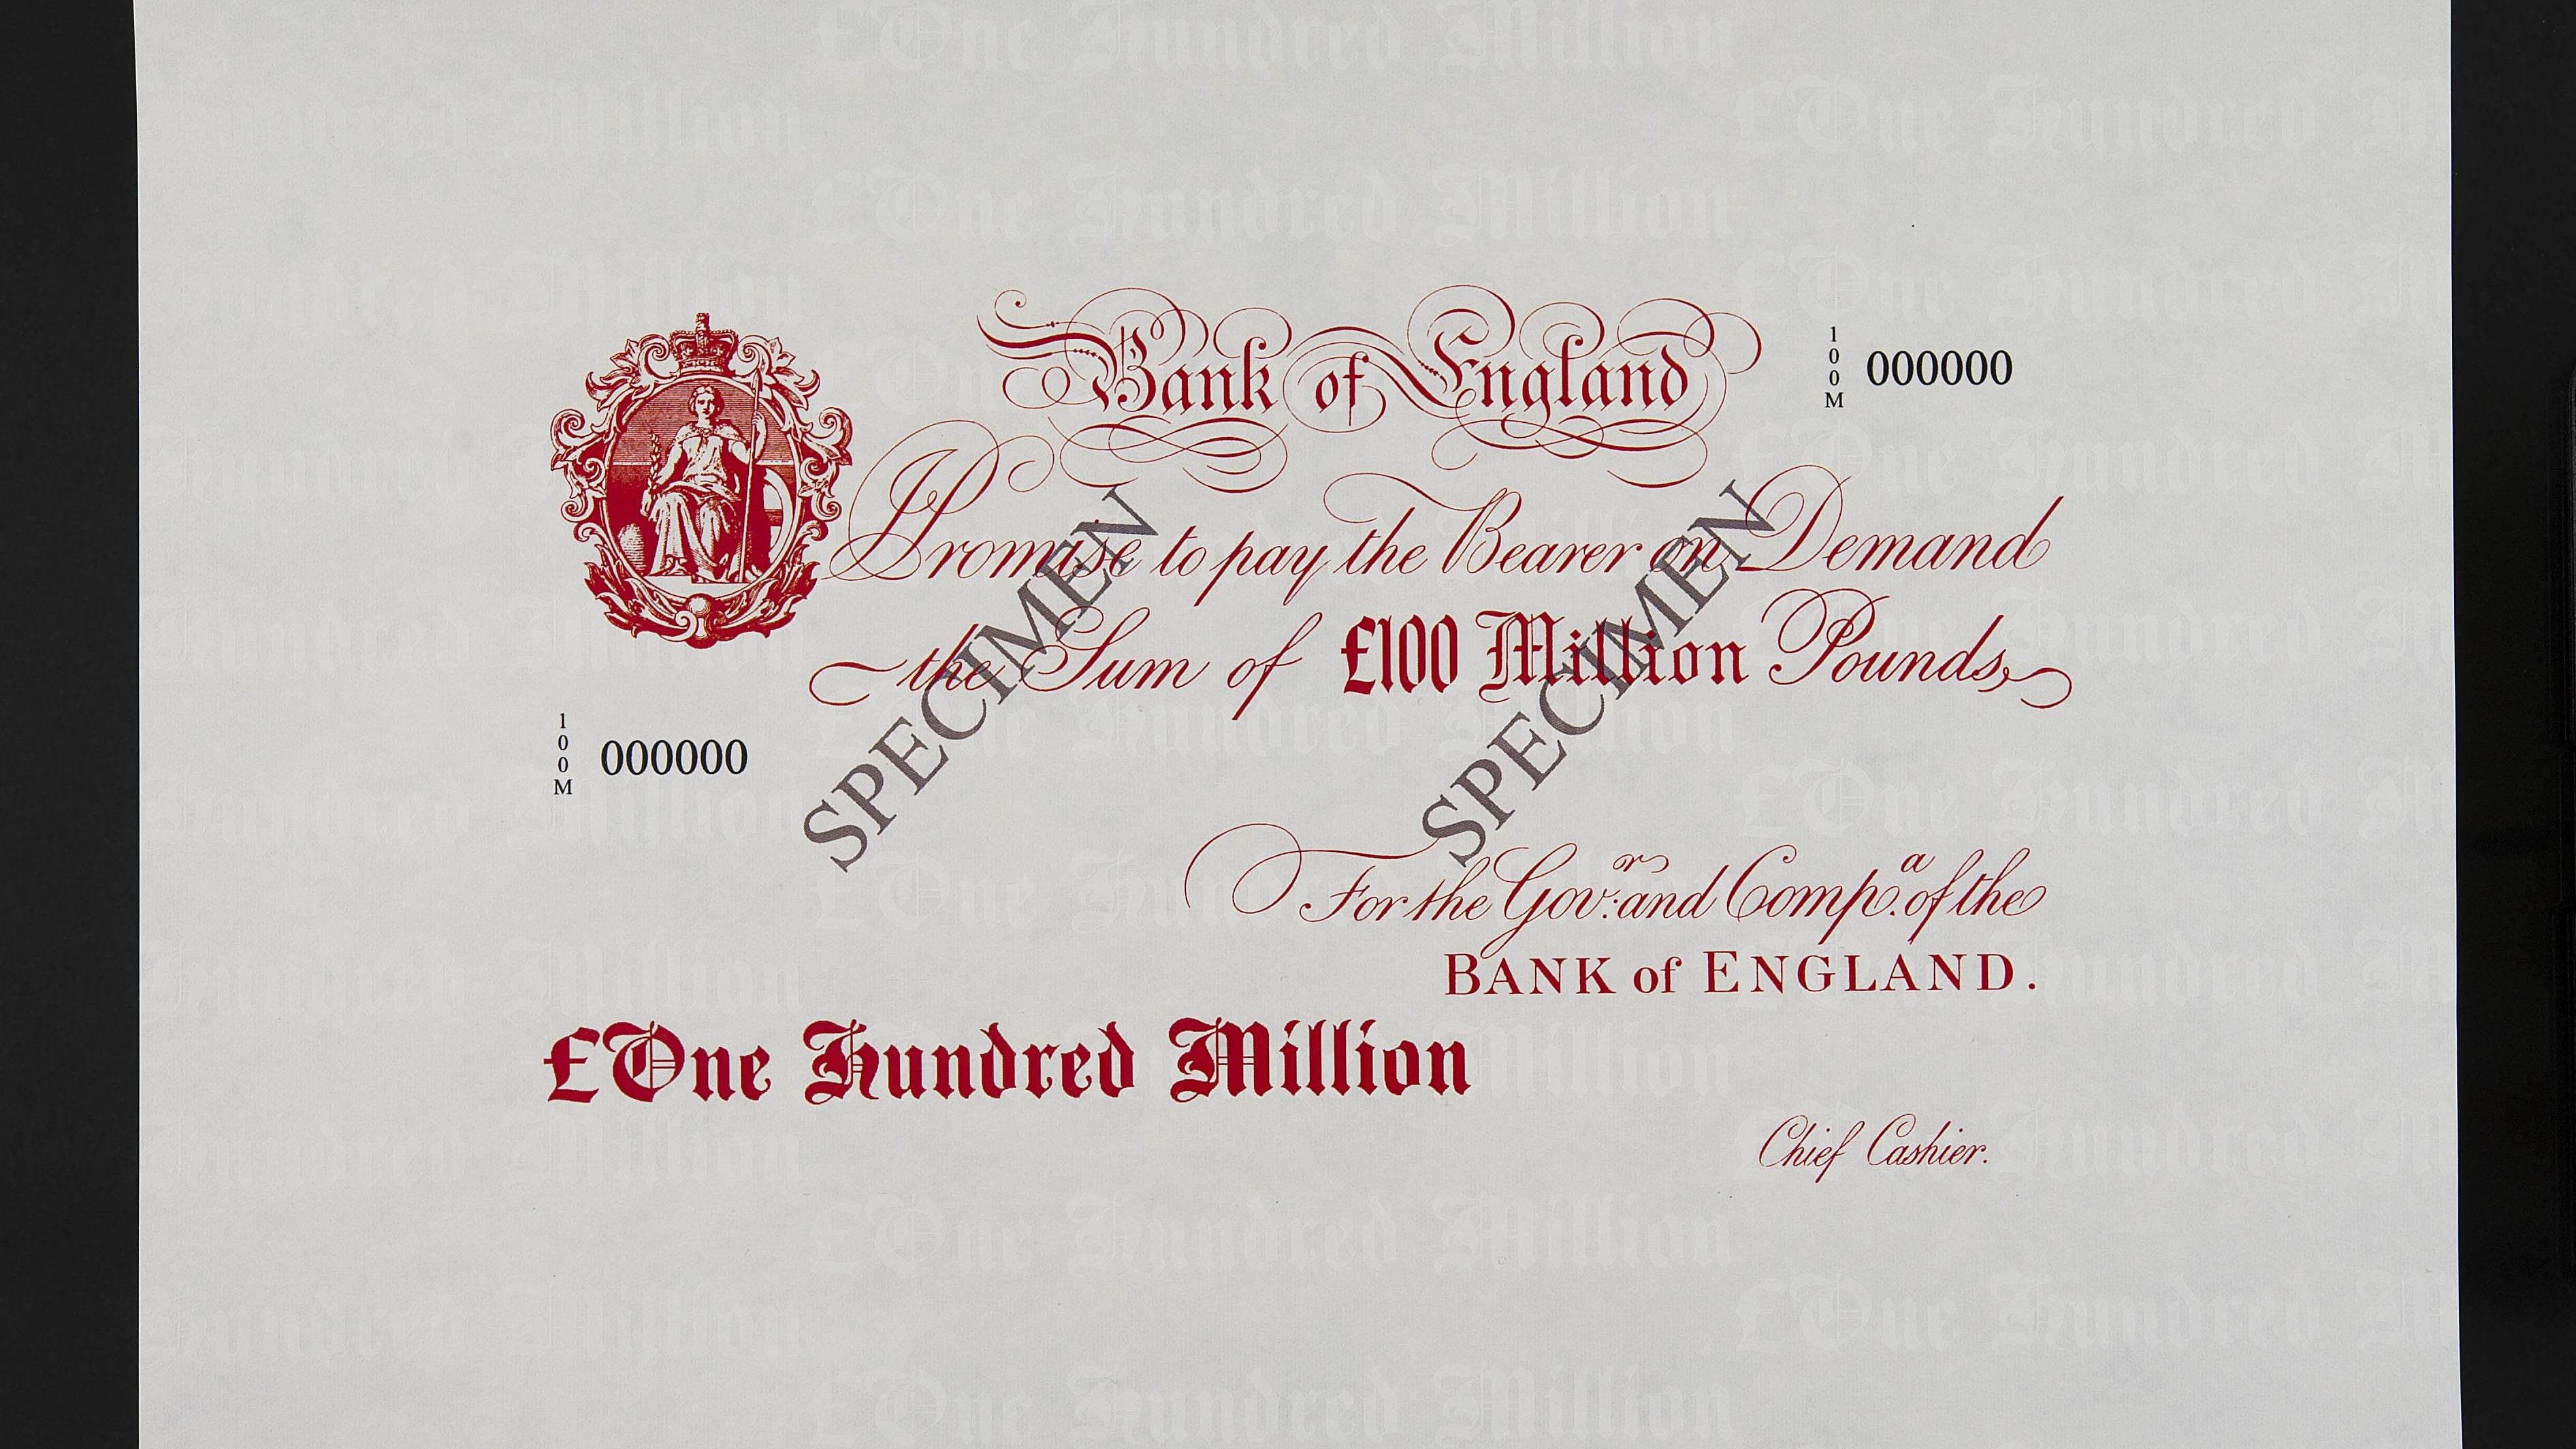 bank of england bt form